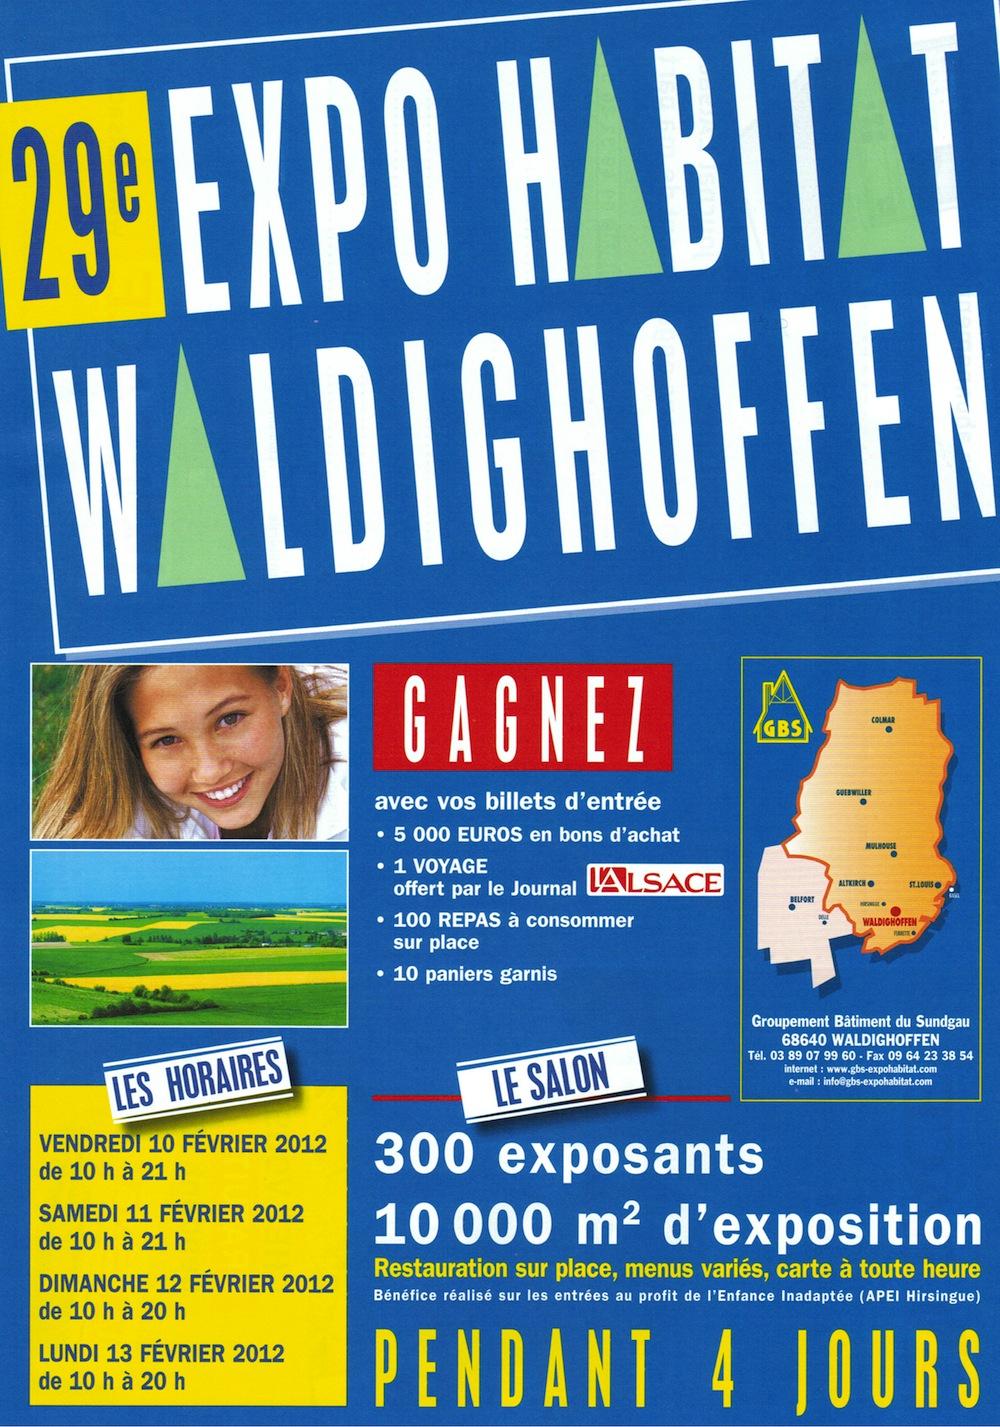 Affiche Expo Habitat 2012